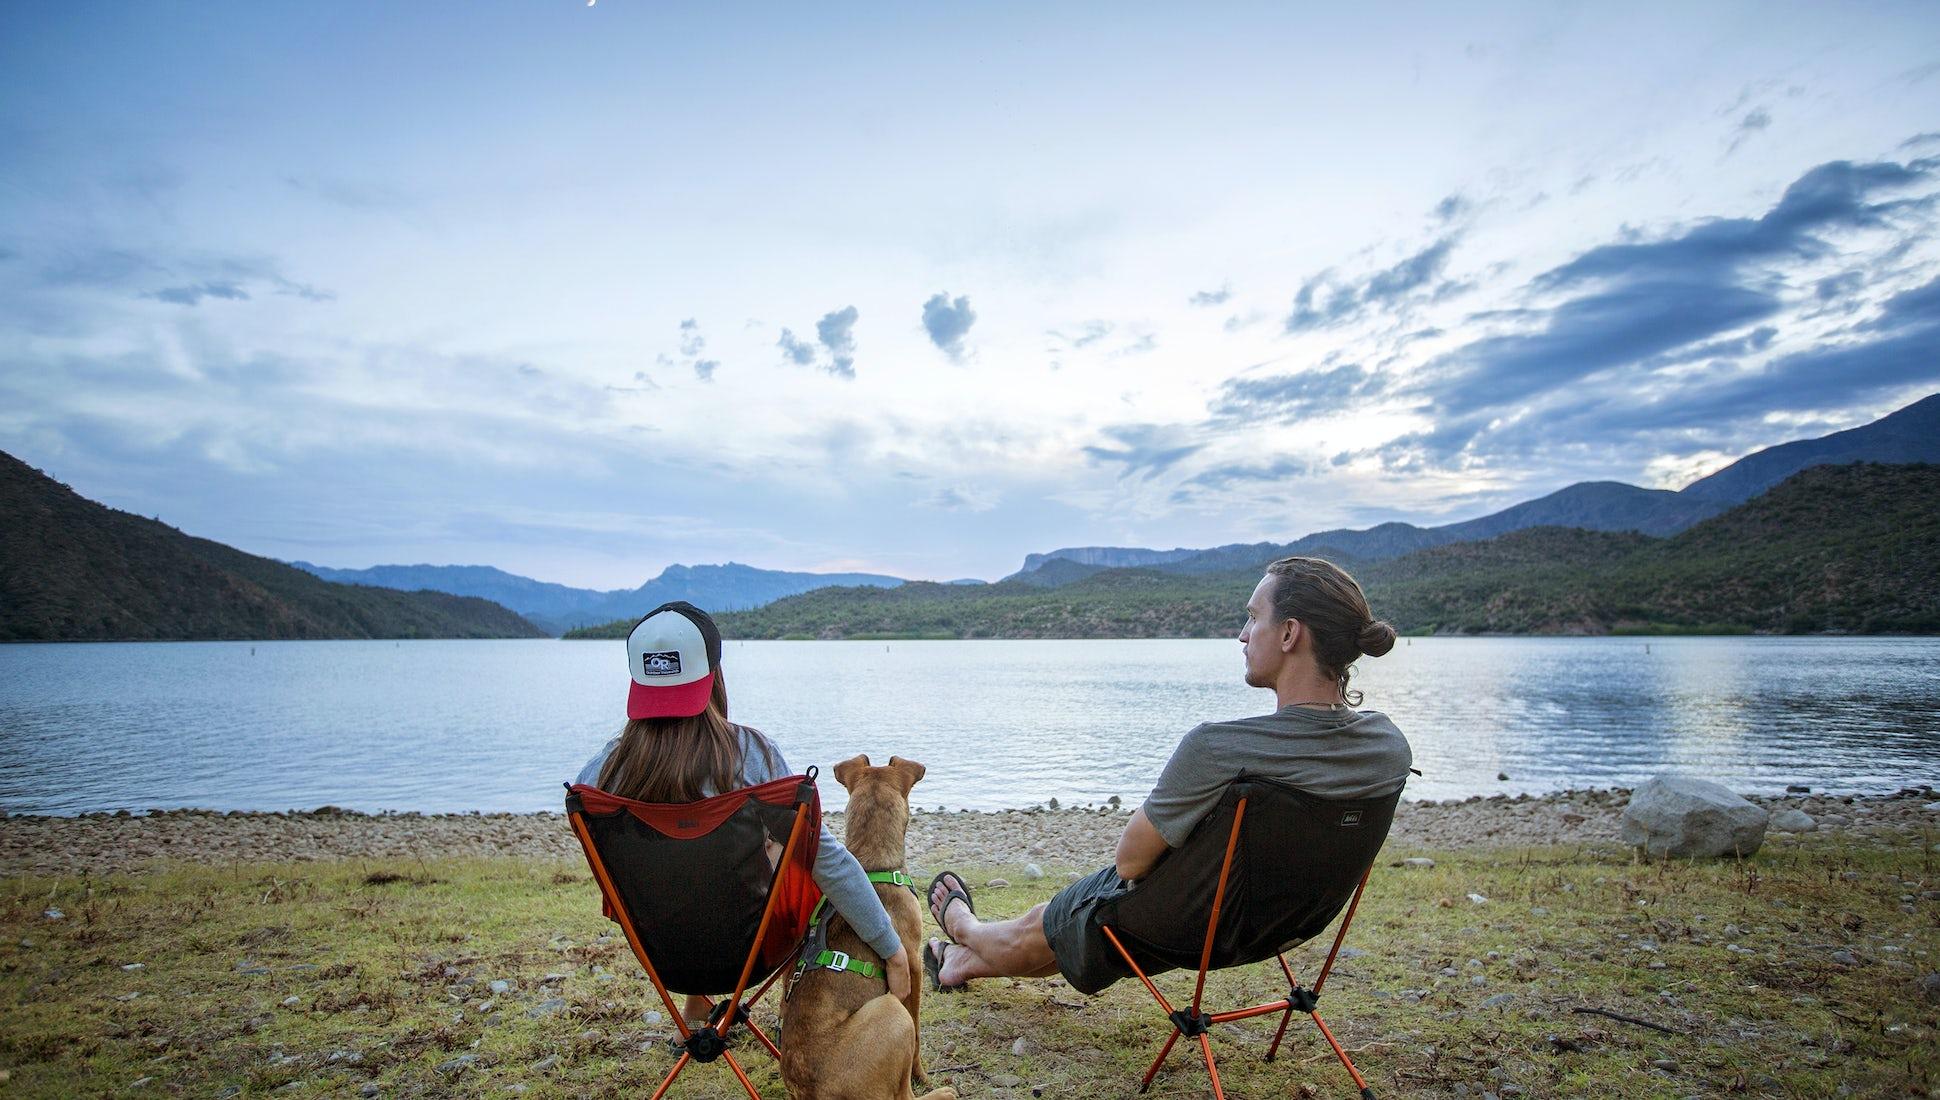 Camping dating sivusto dating Richmond Surrey